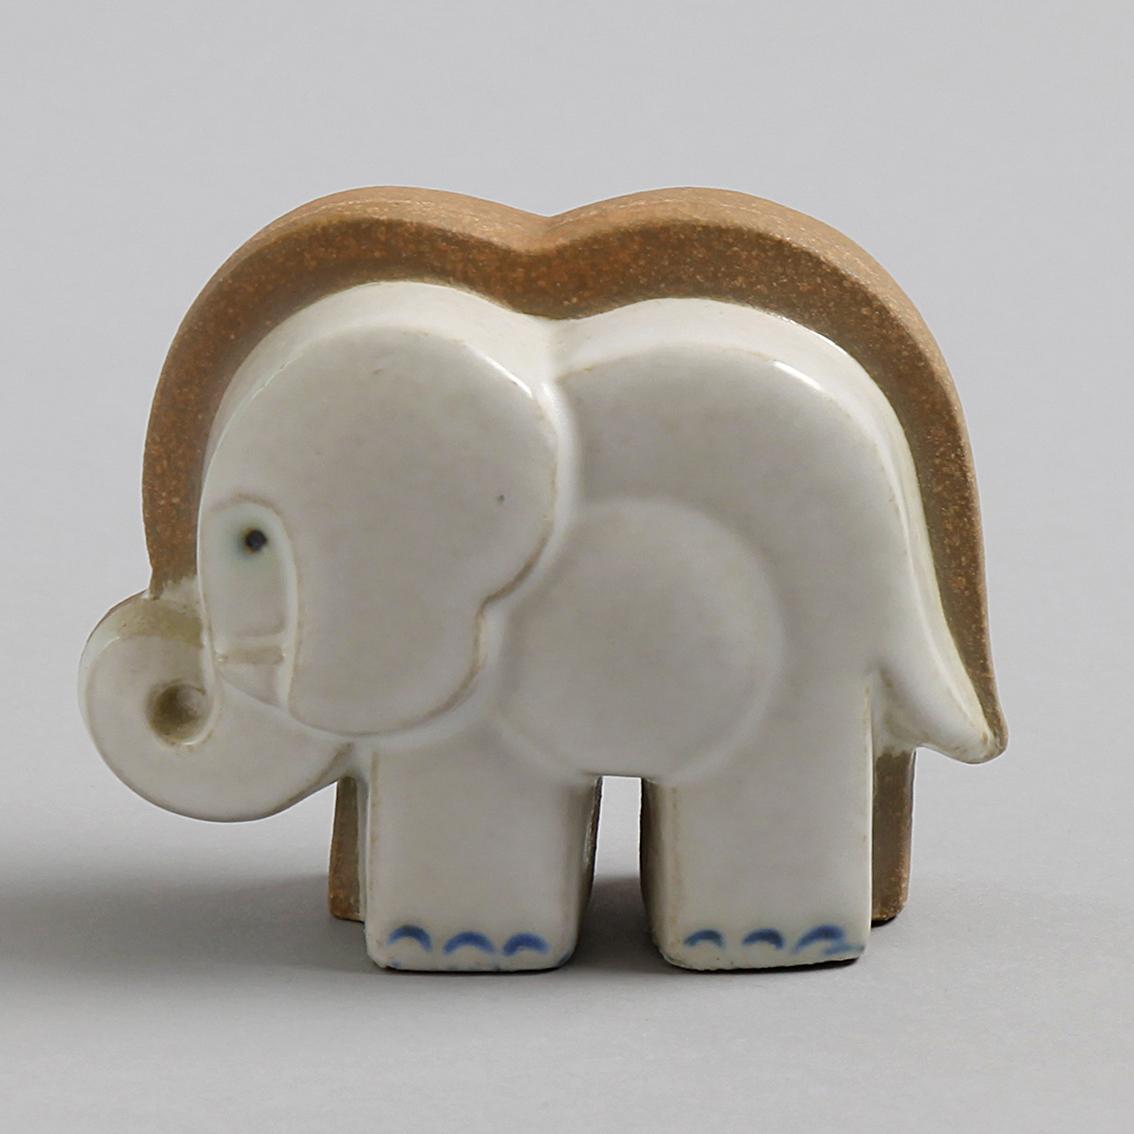 Lisa Larson リサラーソン Elephant 象 グスタフスベリ Gustavsberg 北欧ヴィンテージ